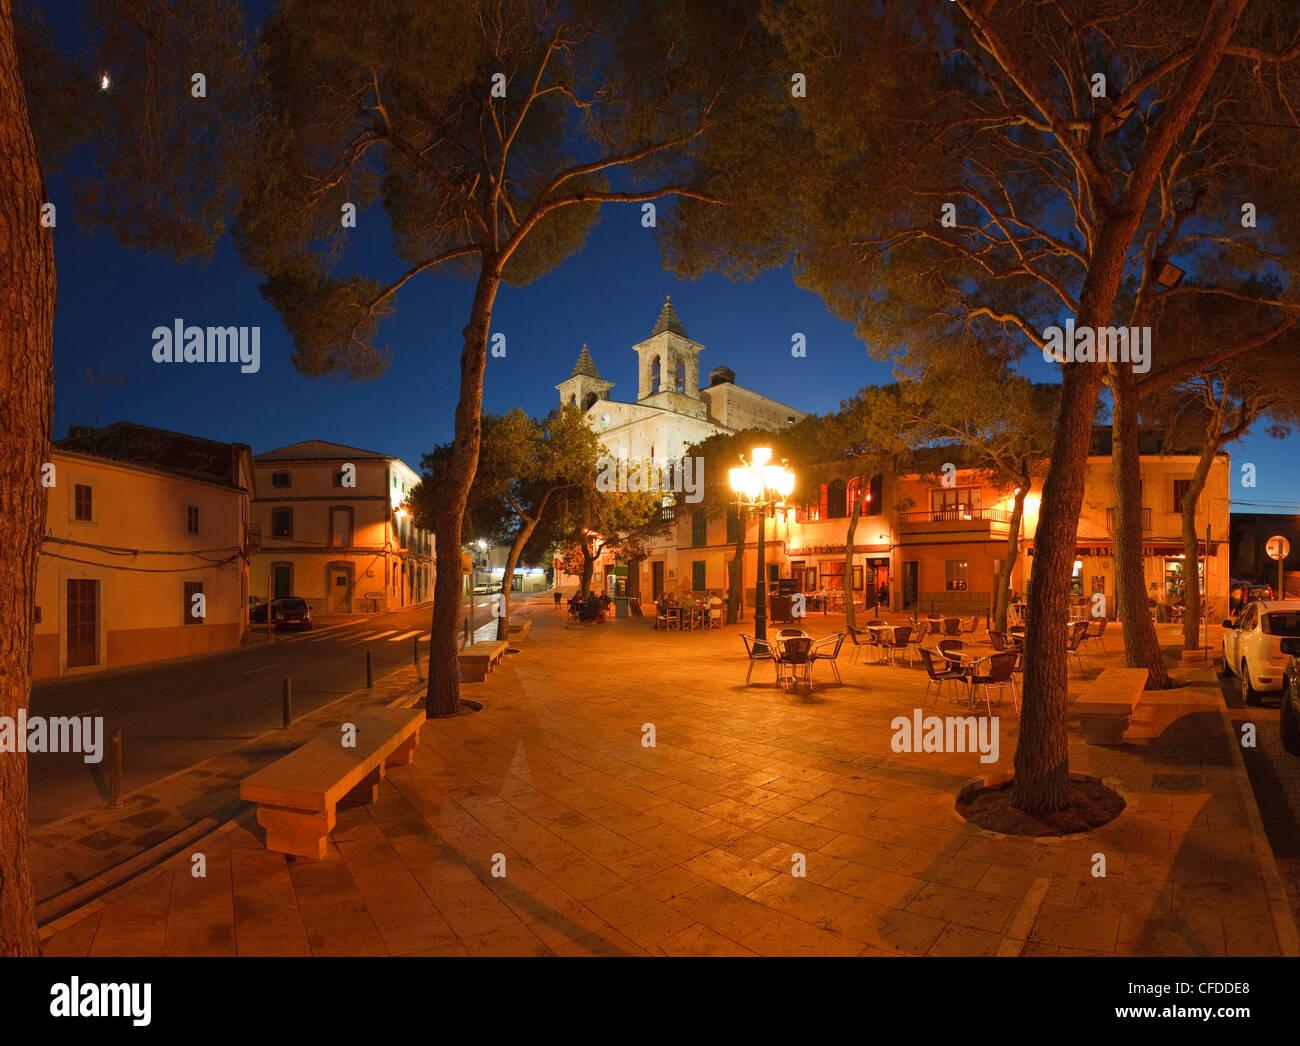 Placa San Jose, quadrato, S Alqueria Blanca, Maiorca, isole Baleari, Spagna, Europa Immagini Stock